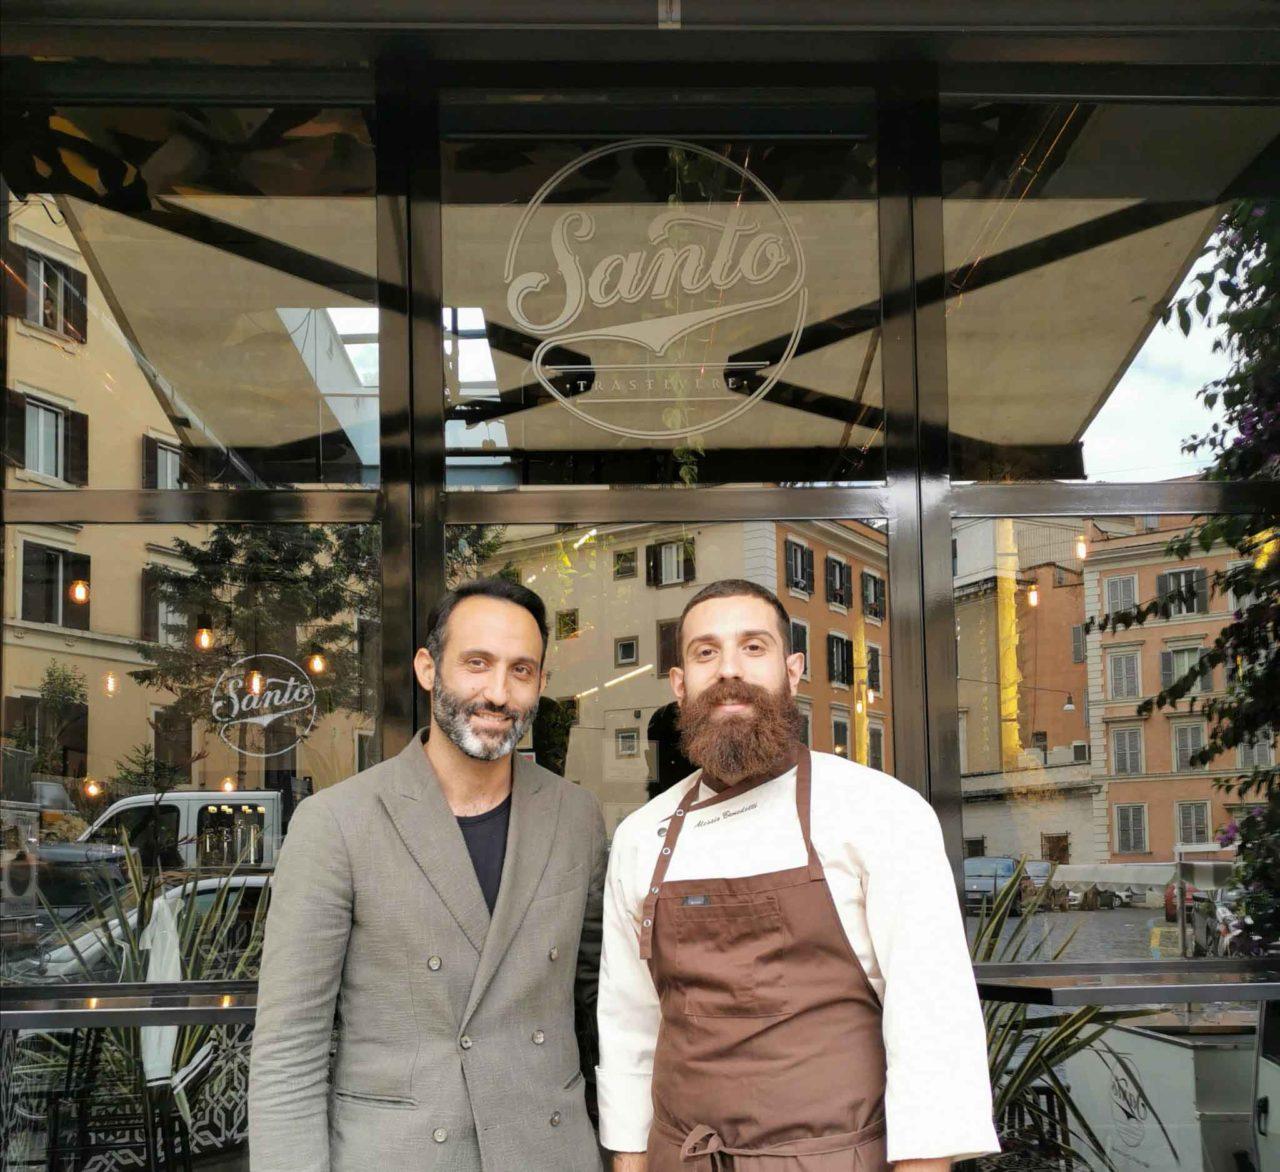 Santo Trastevere ristorante Roma staff